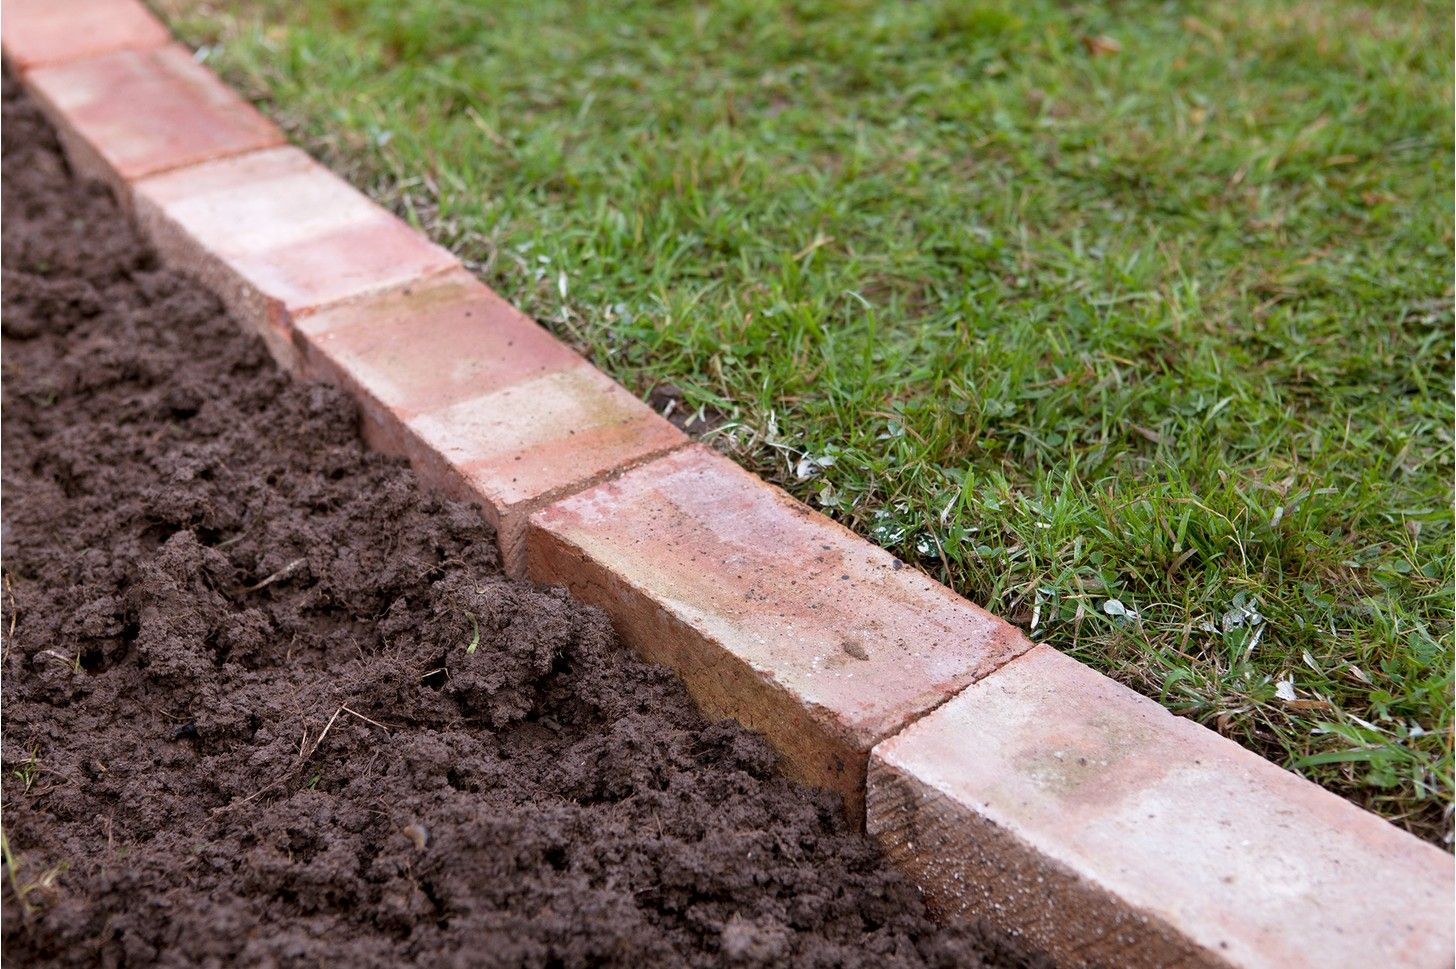 How To Edge A Lawn With Bricks Brick Garden Edging Lawn 400 x 300